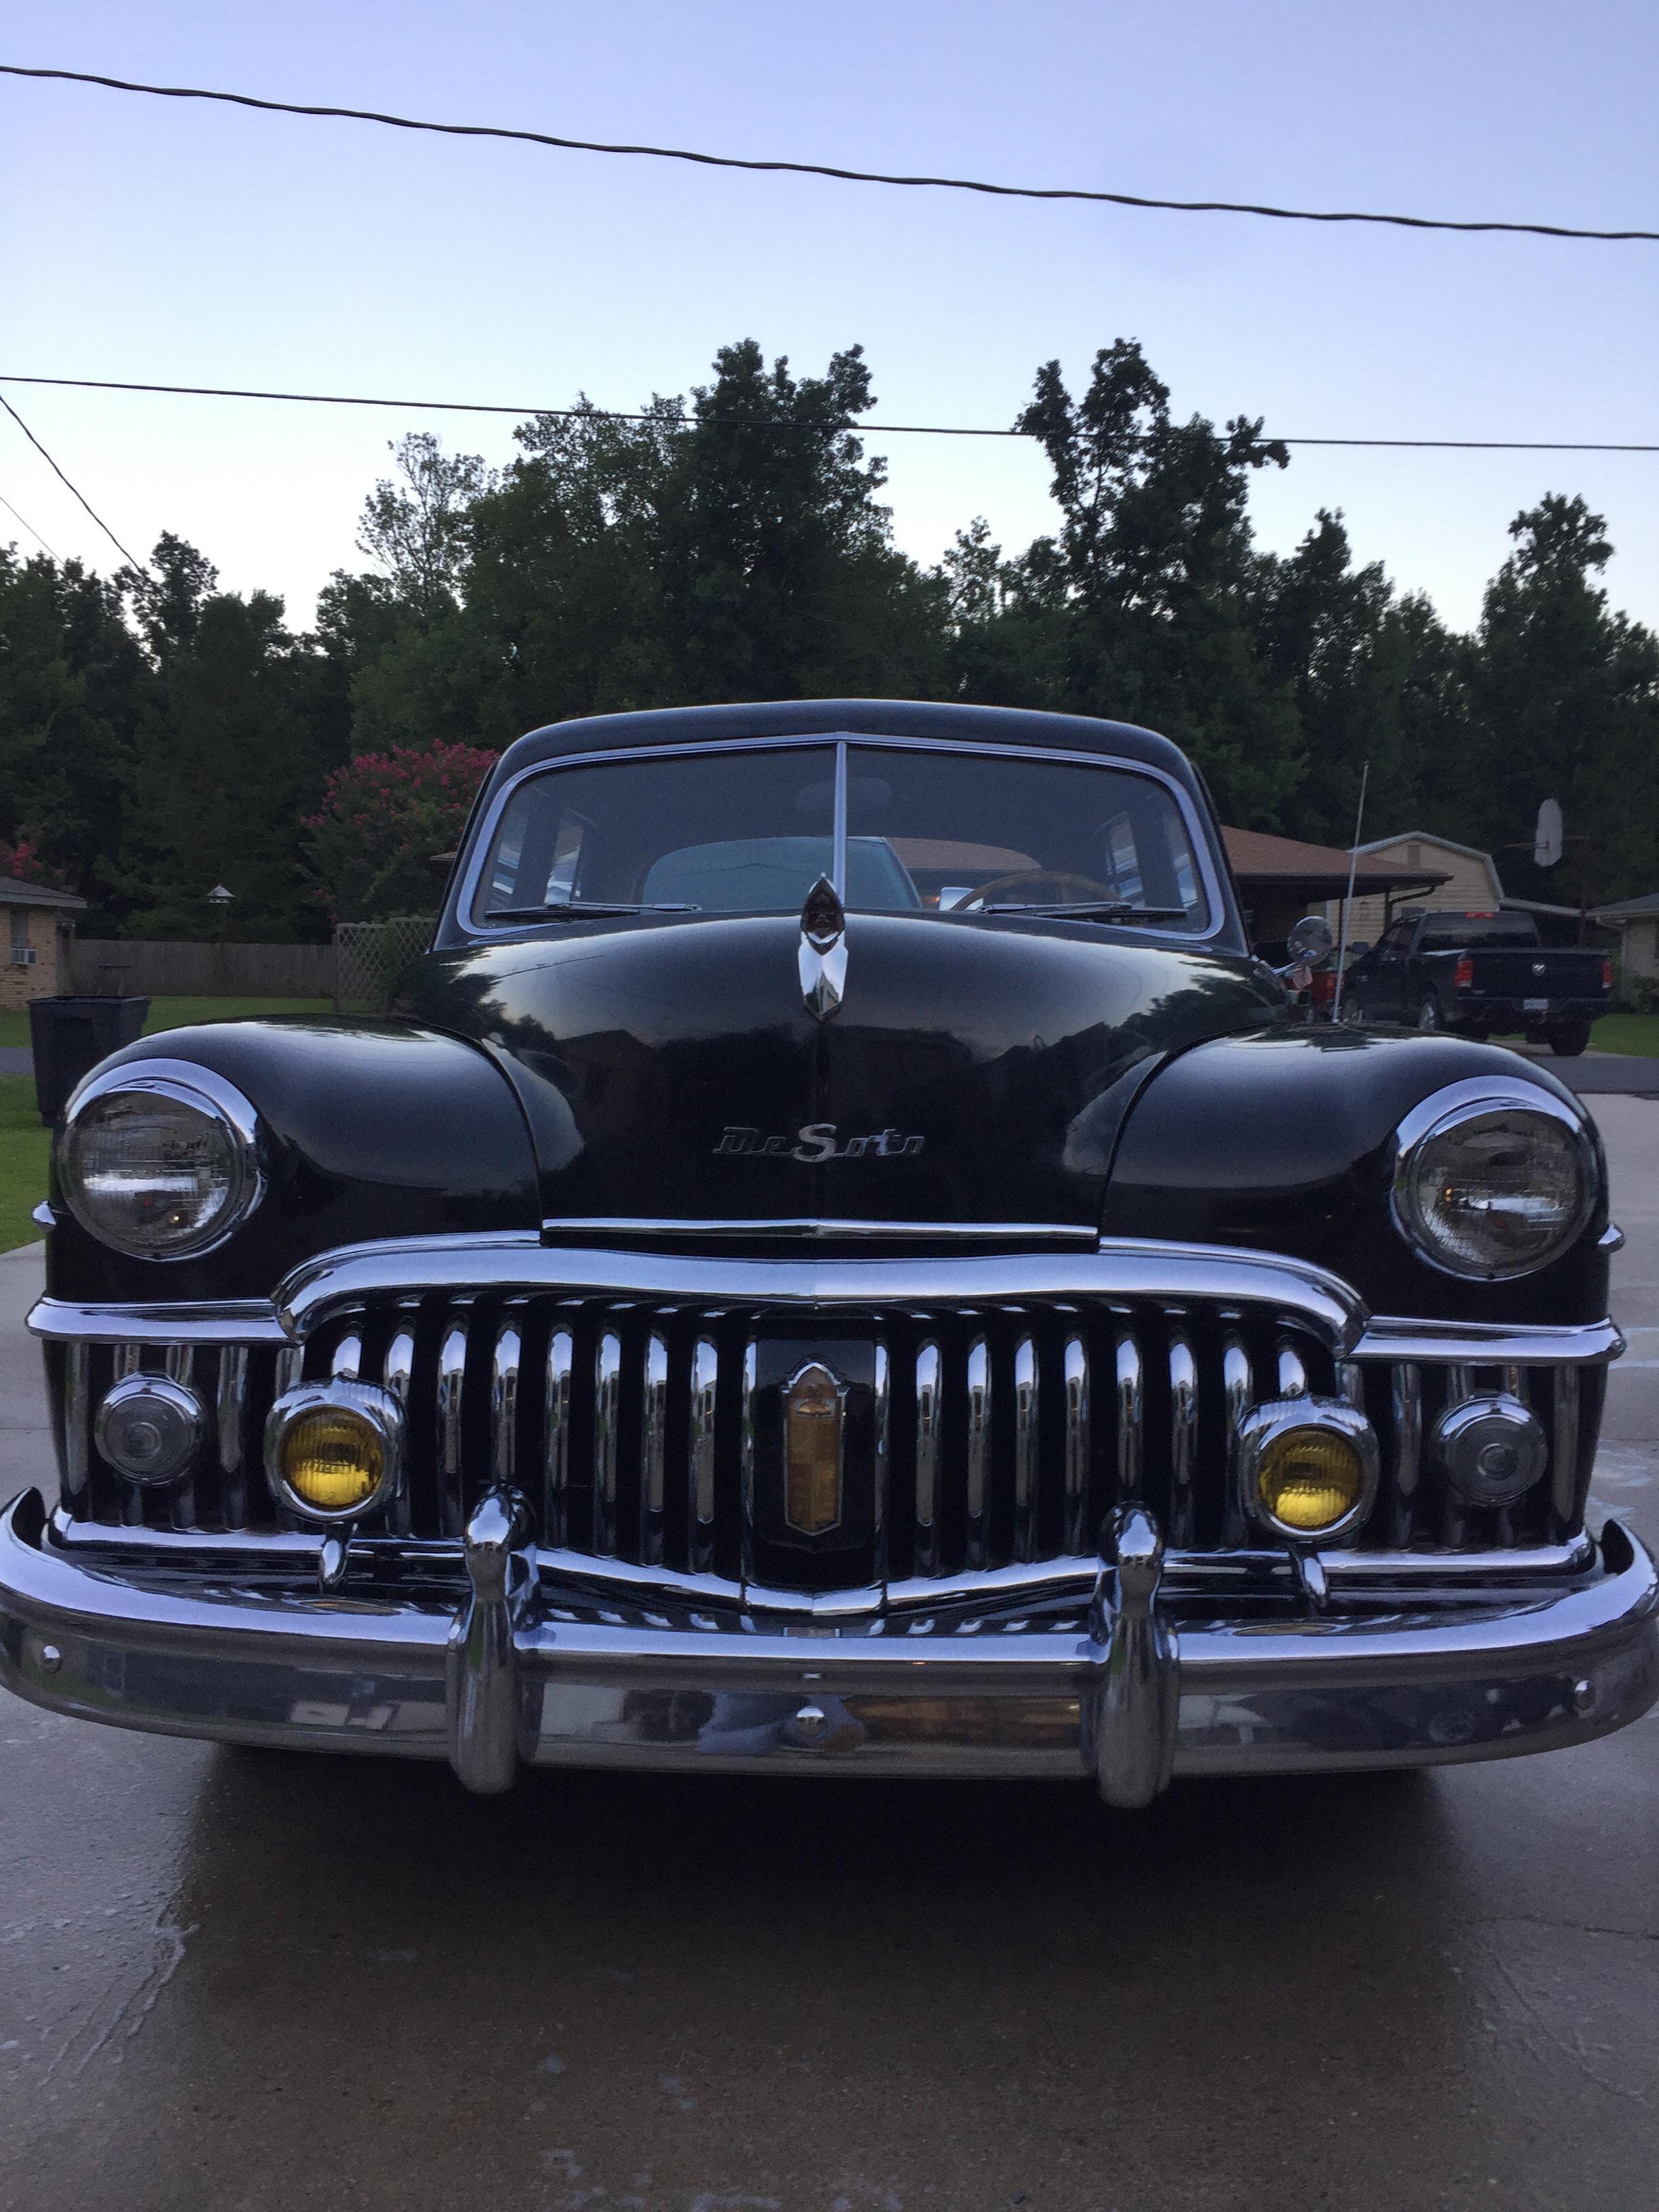 1950 desoto for sale $13,500 - Cars For Sale - Antique